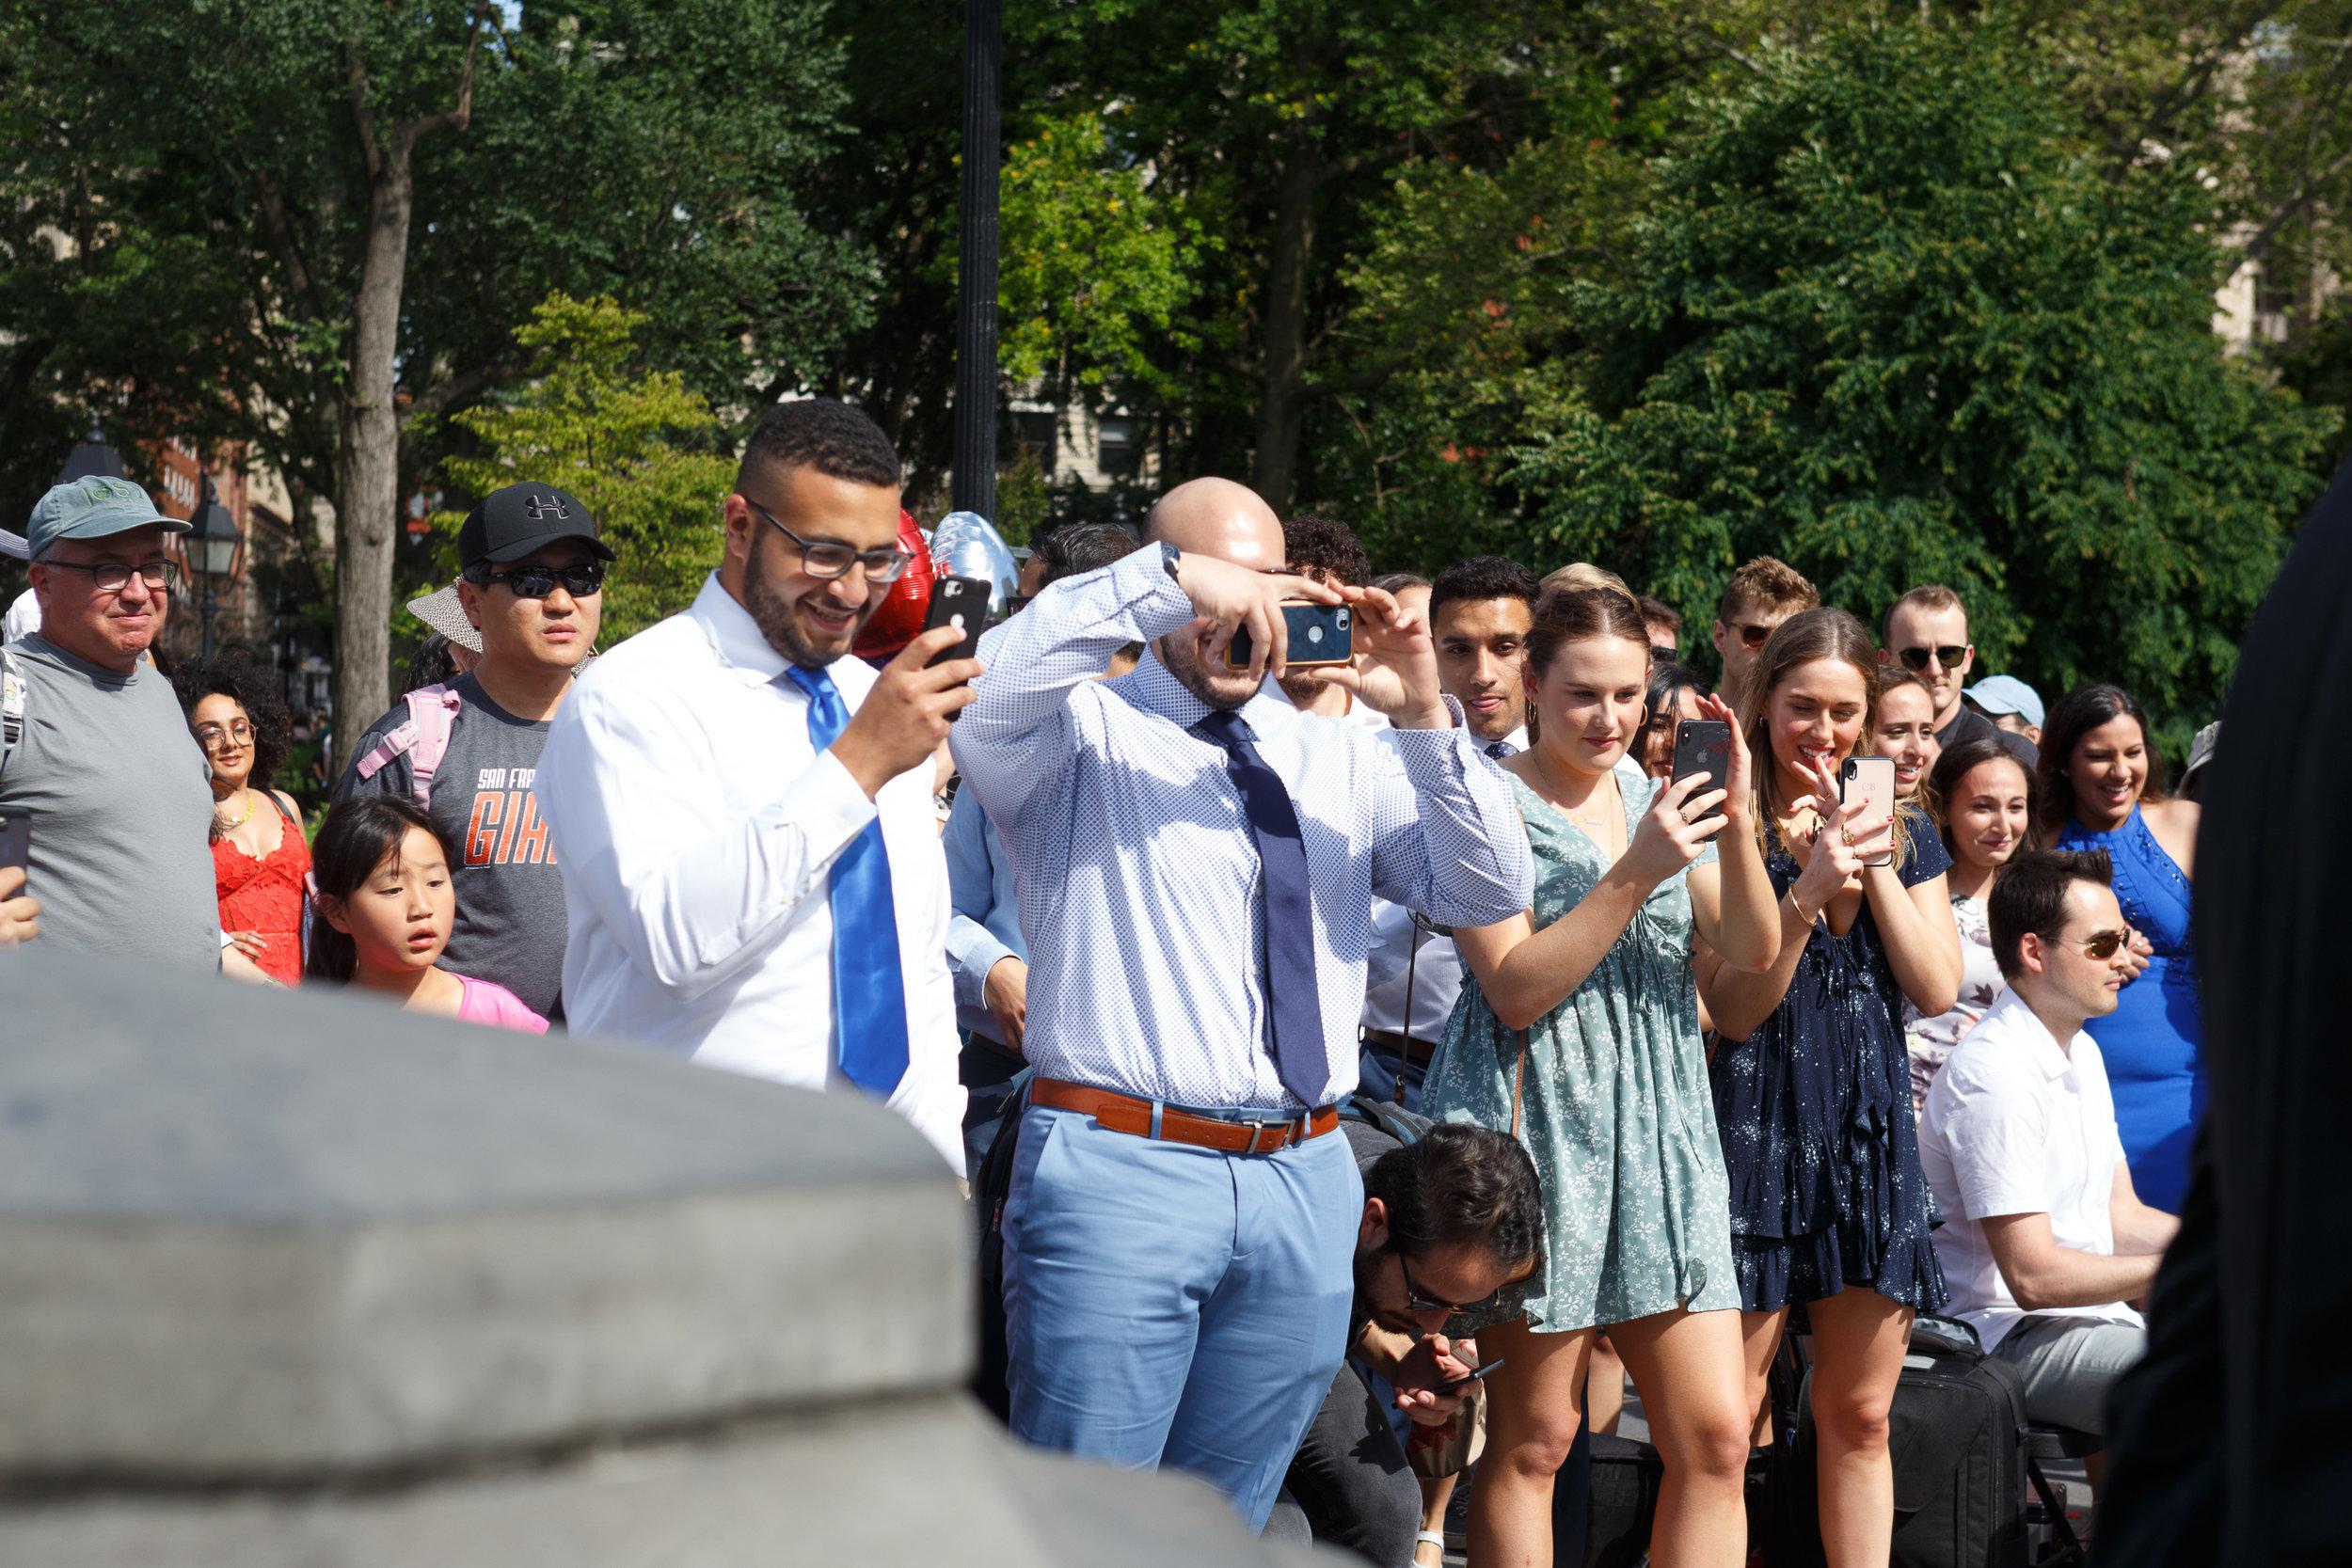 Kiro Rebecca Washington Square Park Marriage Proposal _ Jonathan Heisler _ 6152019 _015.jpg